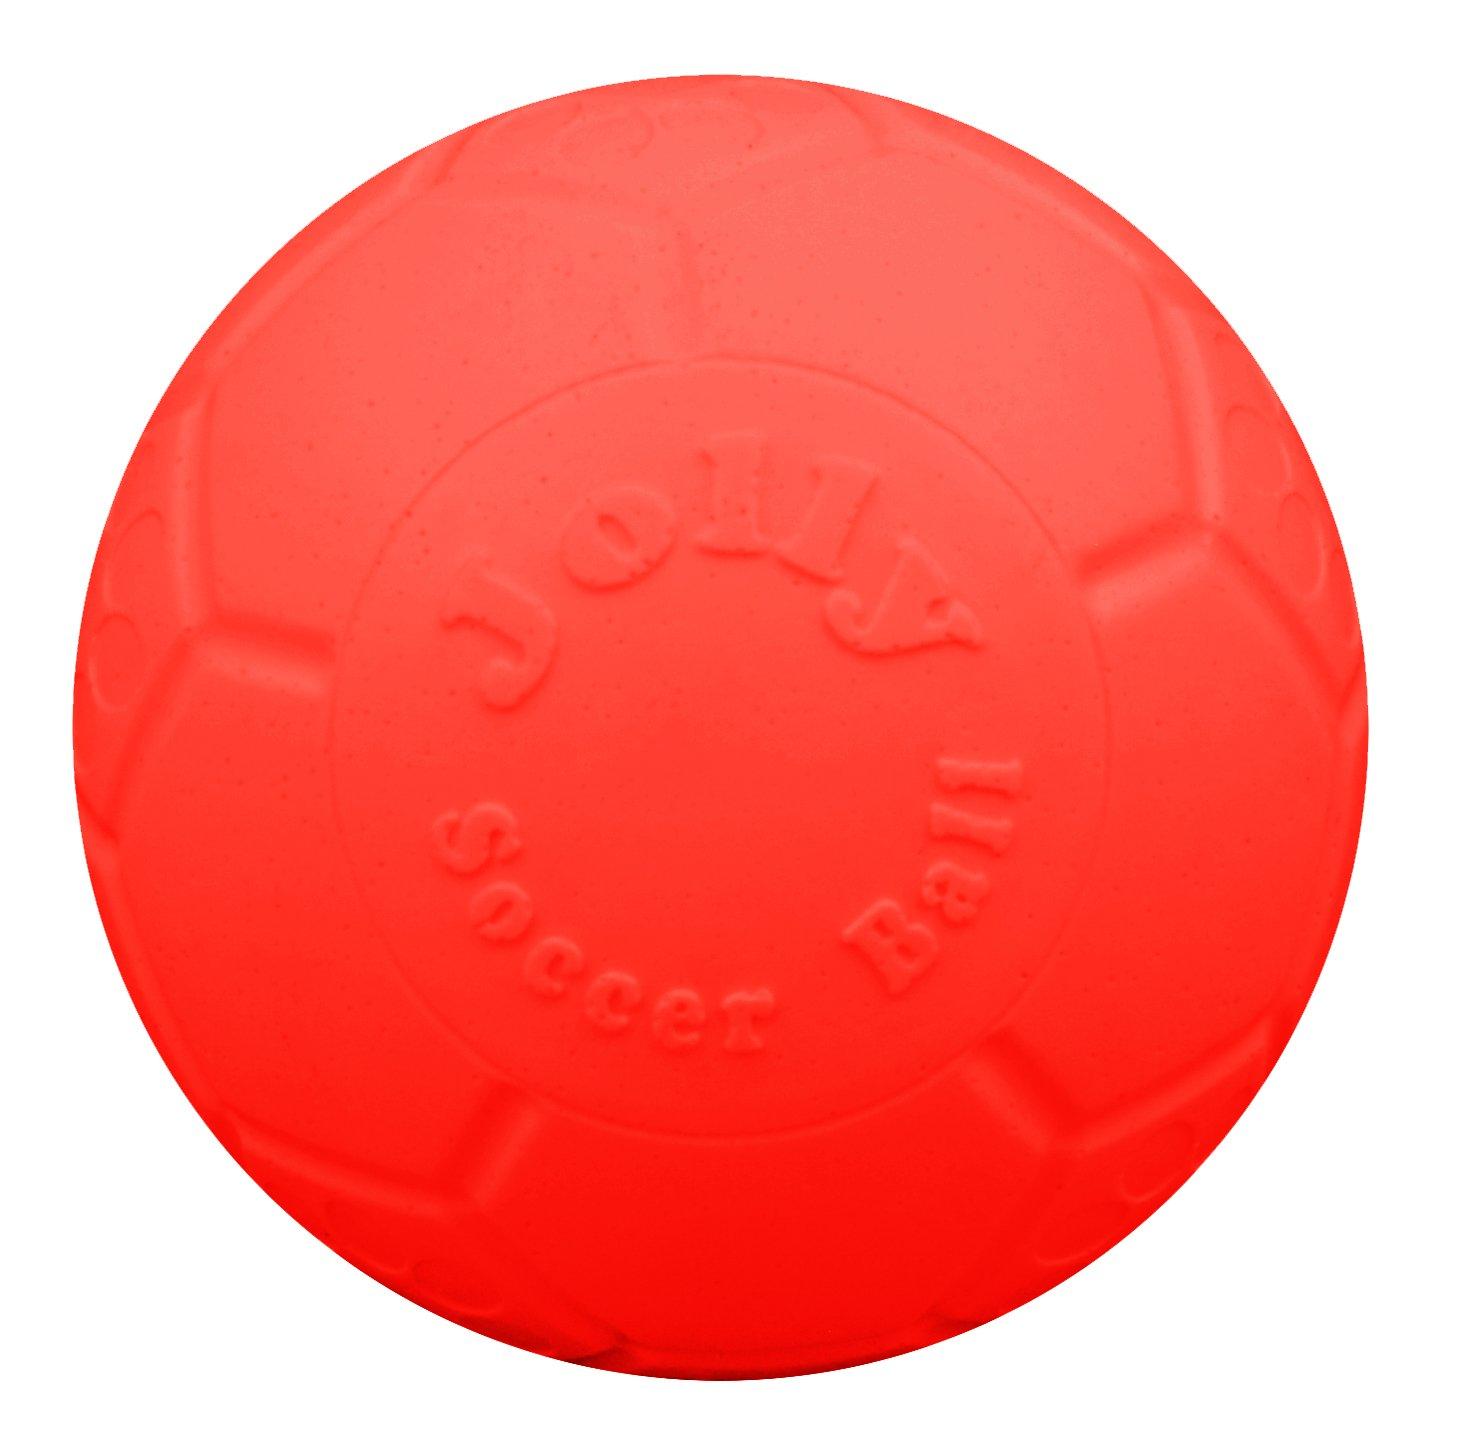 Jolly Pets Ballon de Foot DE 20, 3cm Horesemans Pride/Jolly Pets SB08 Ocean